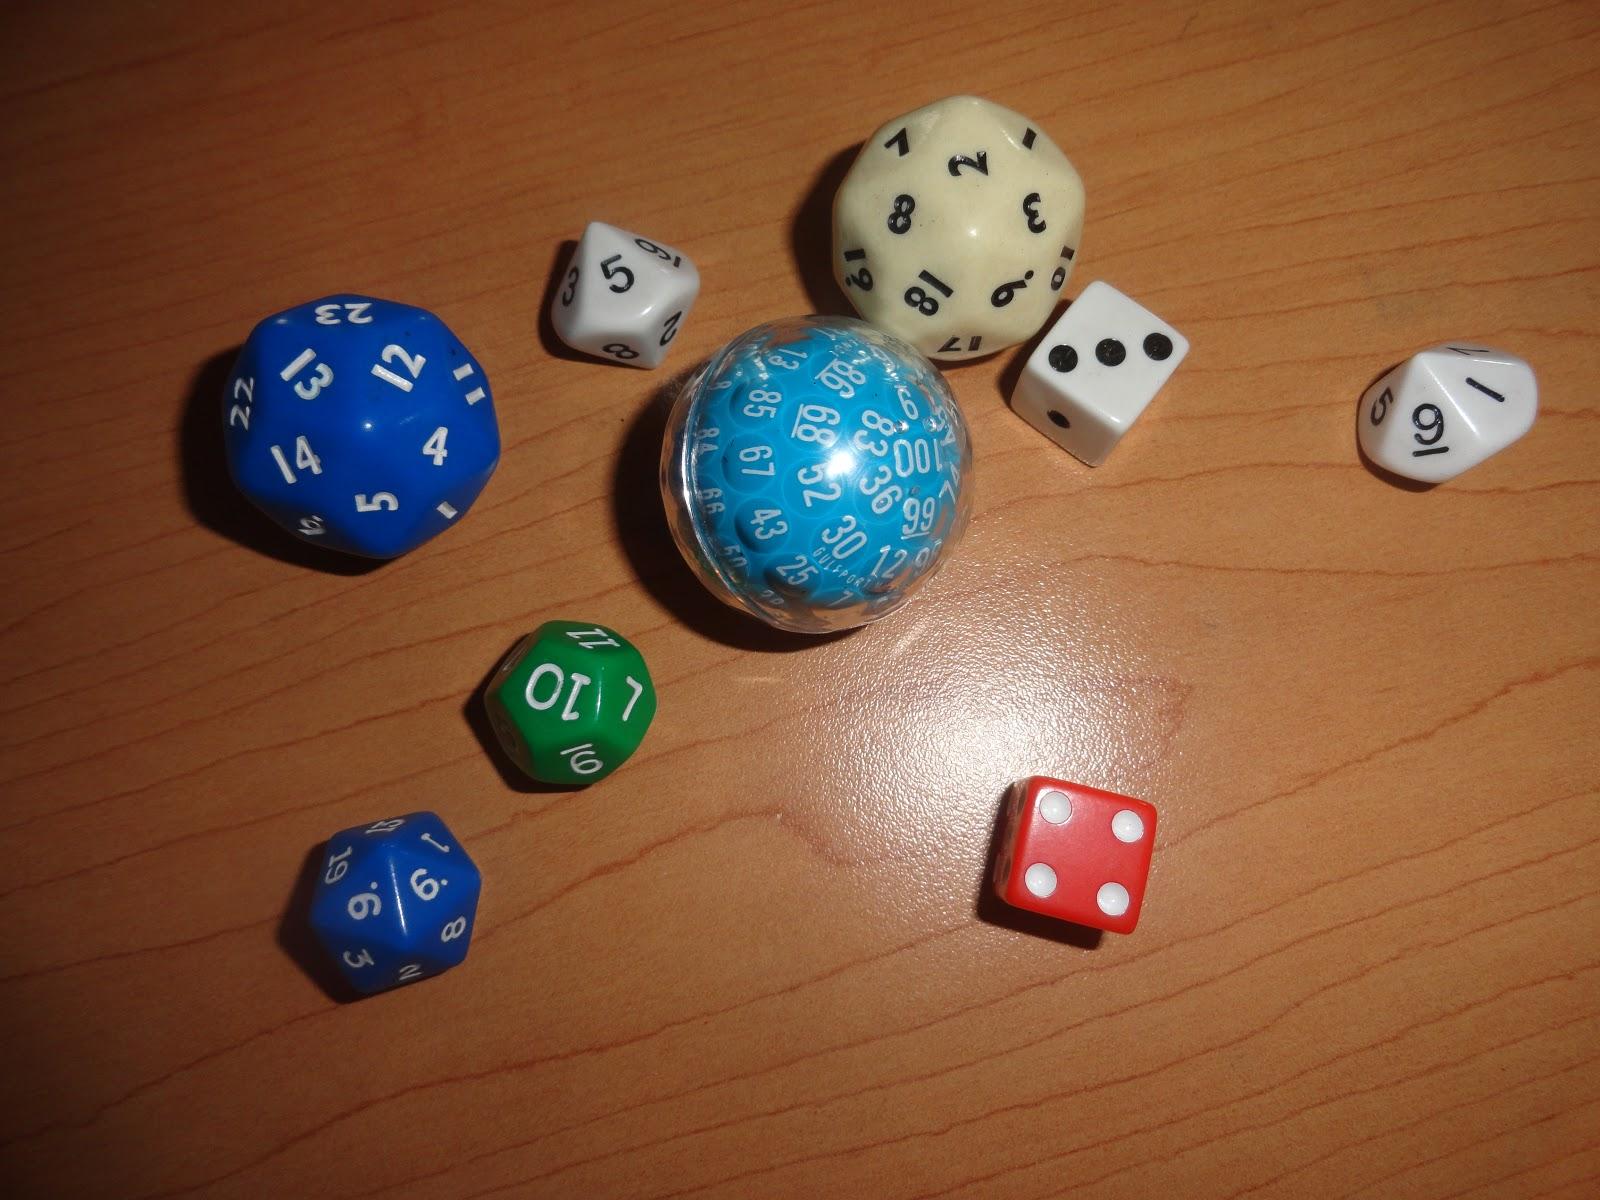 4 5 6 dice